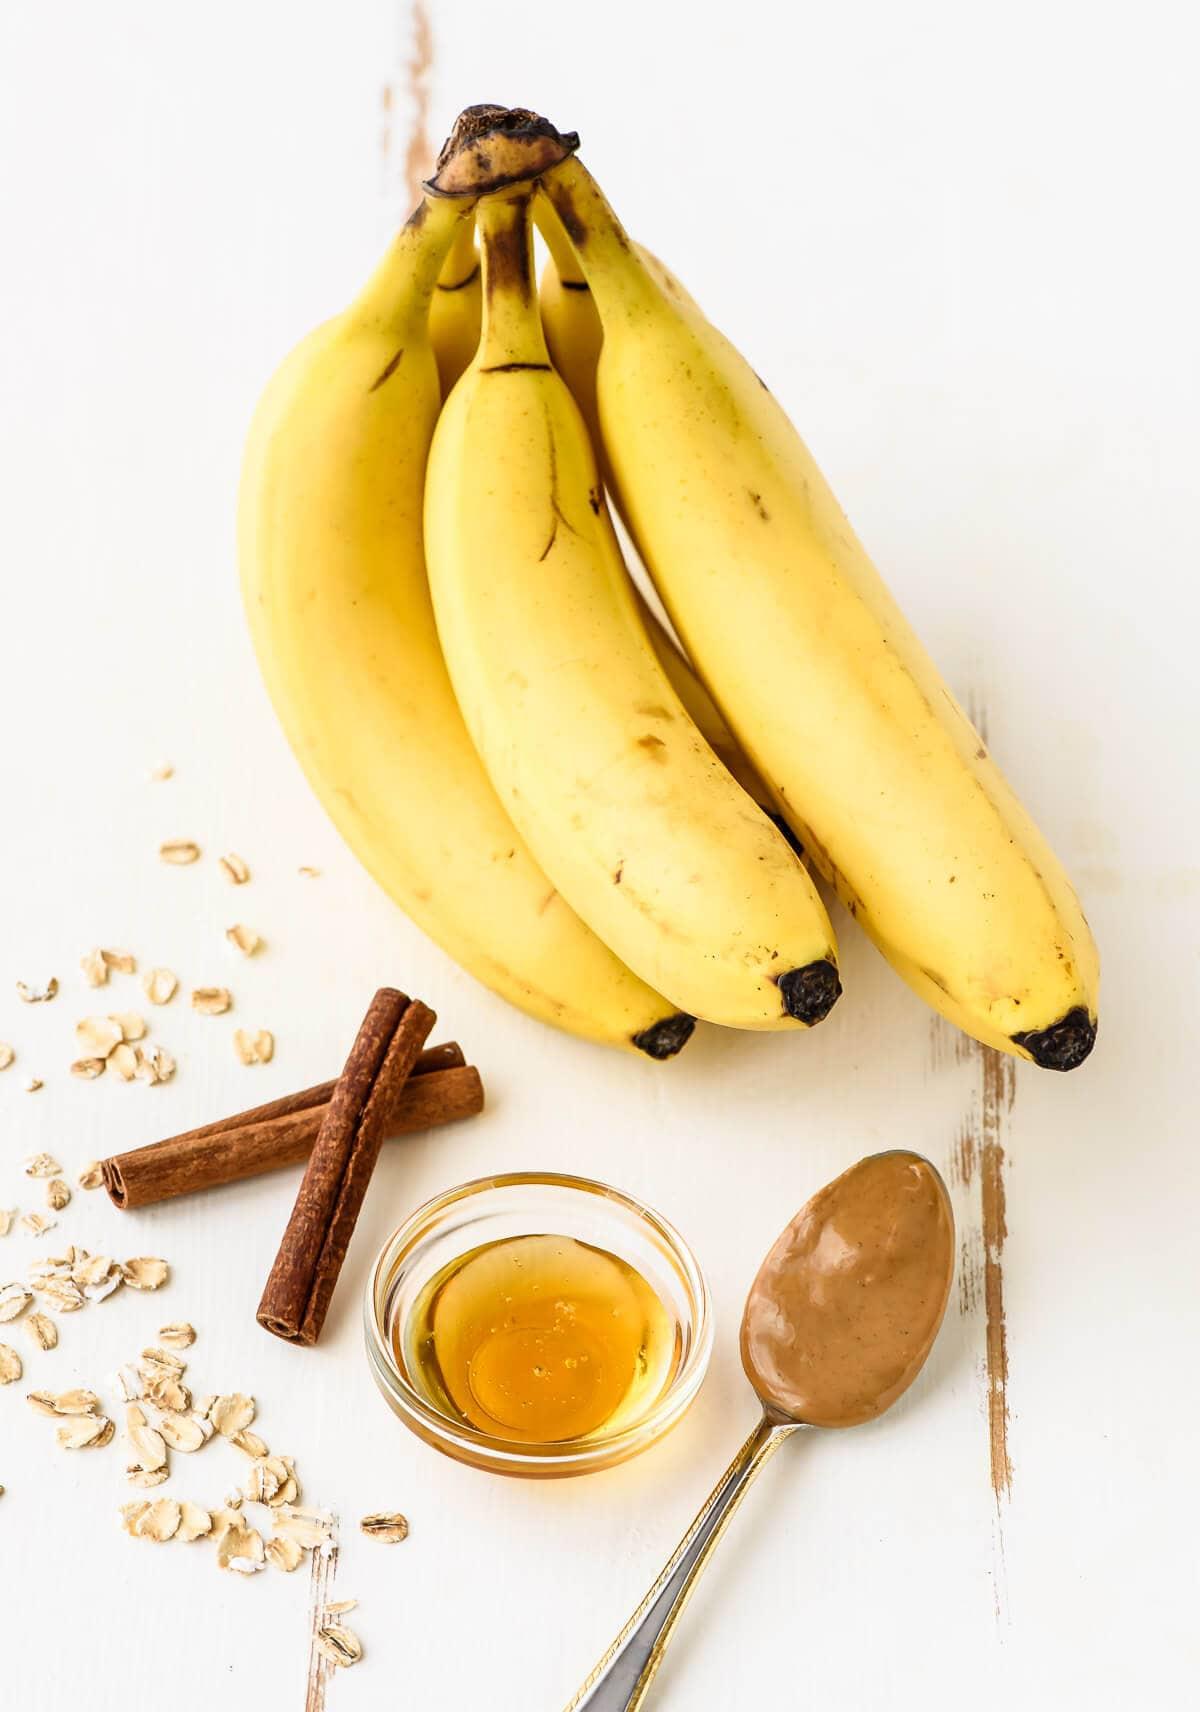 Ingredients needed to make Banana Honey Oatmeal Breakfast Bars